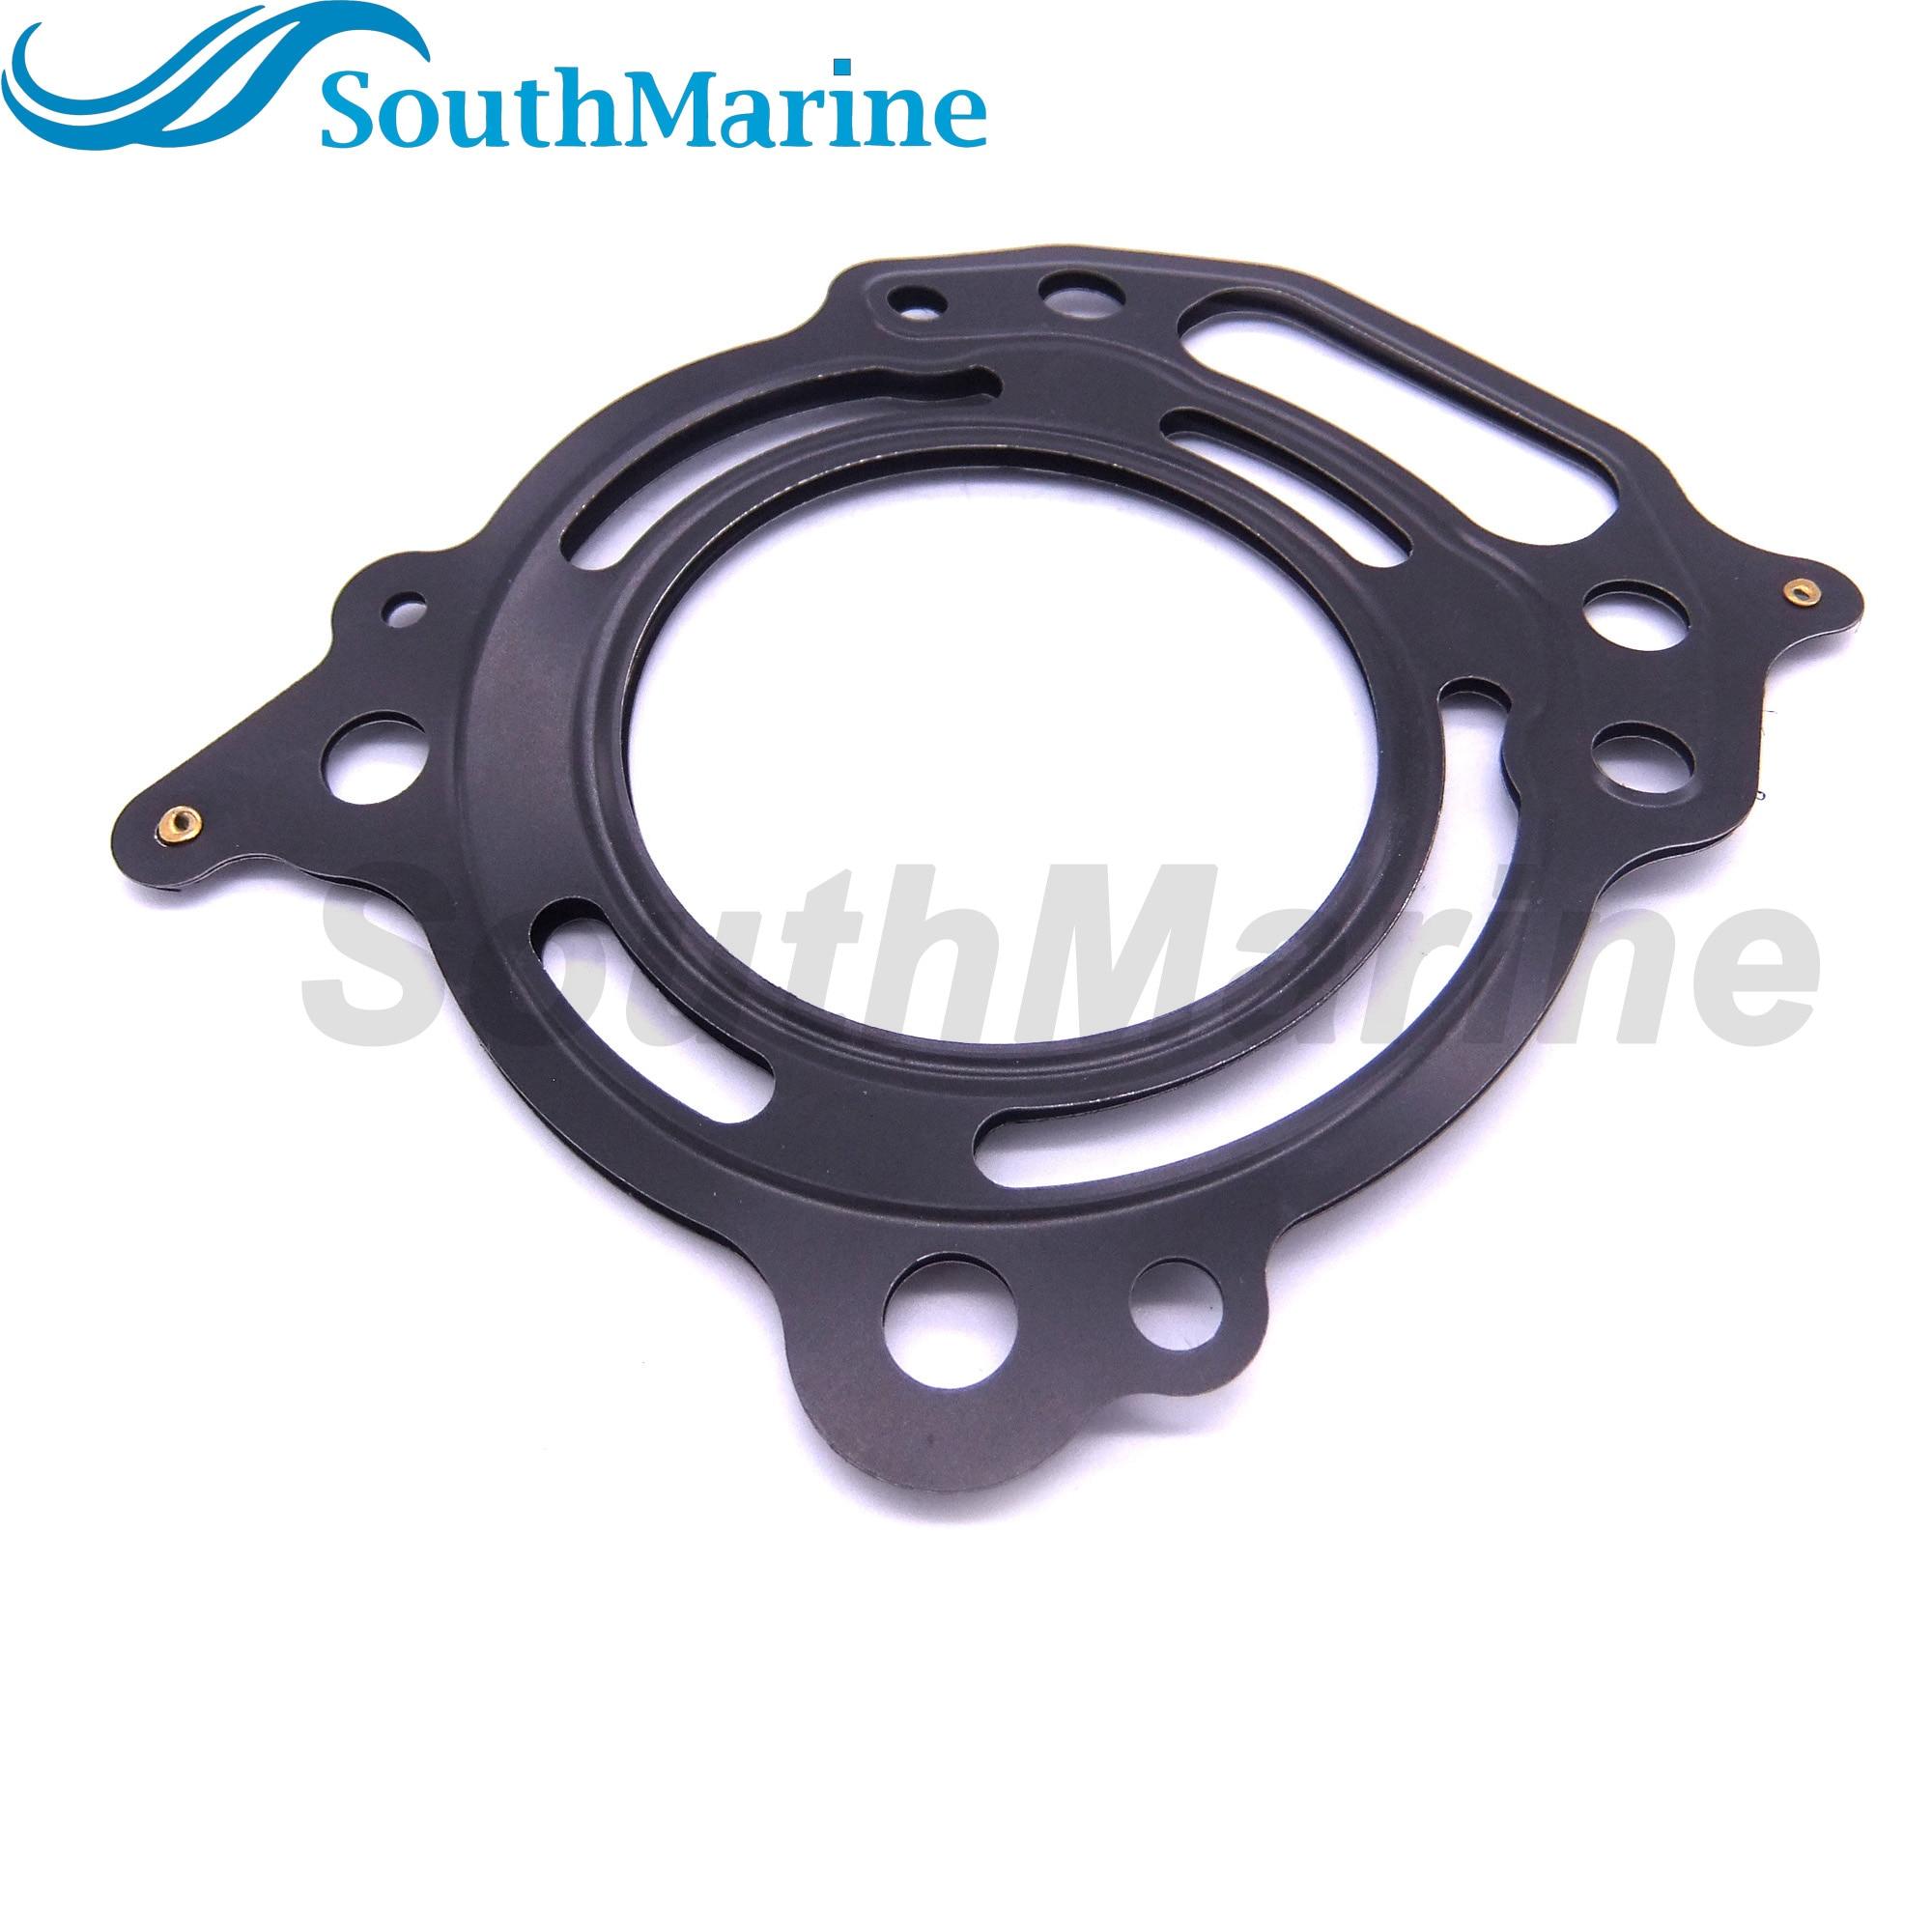 3H6-01005-1 3H6010051 3H6010051M Cylinder Head Gasket For Tohatsu Nissan 4hp 5hp 6hp 4-stroke NSF4B NSF5B NSF6B